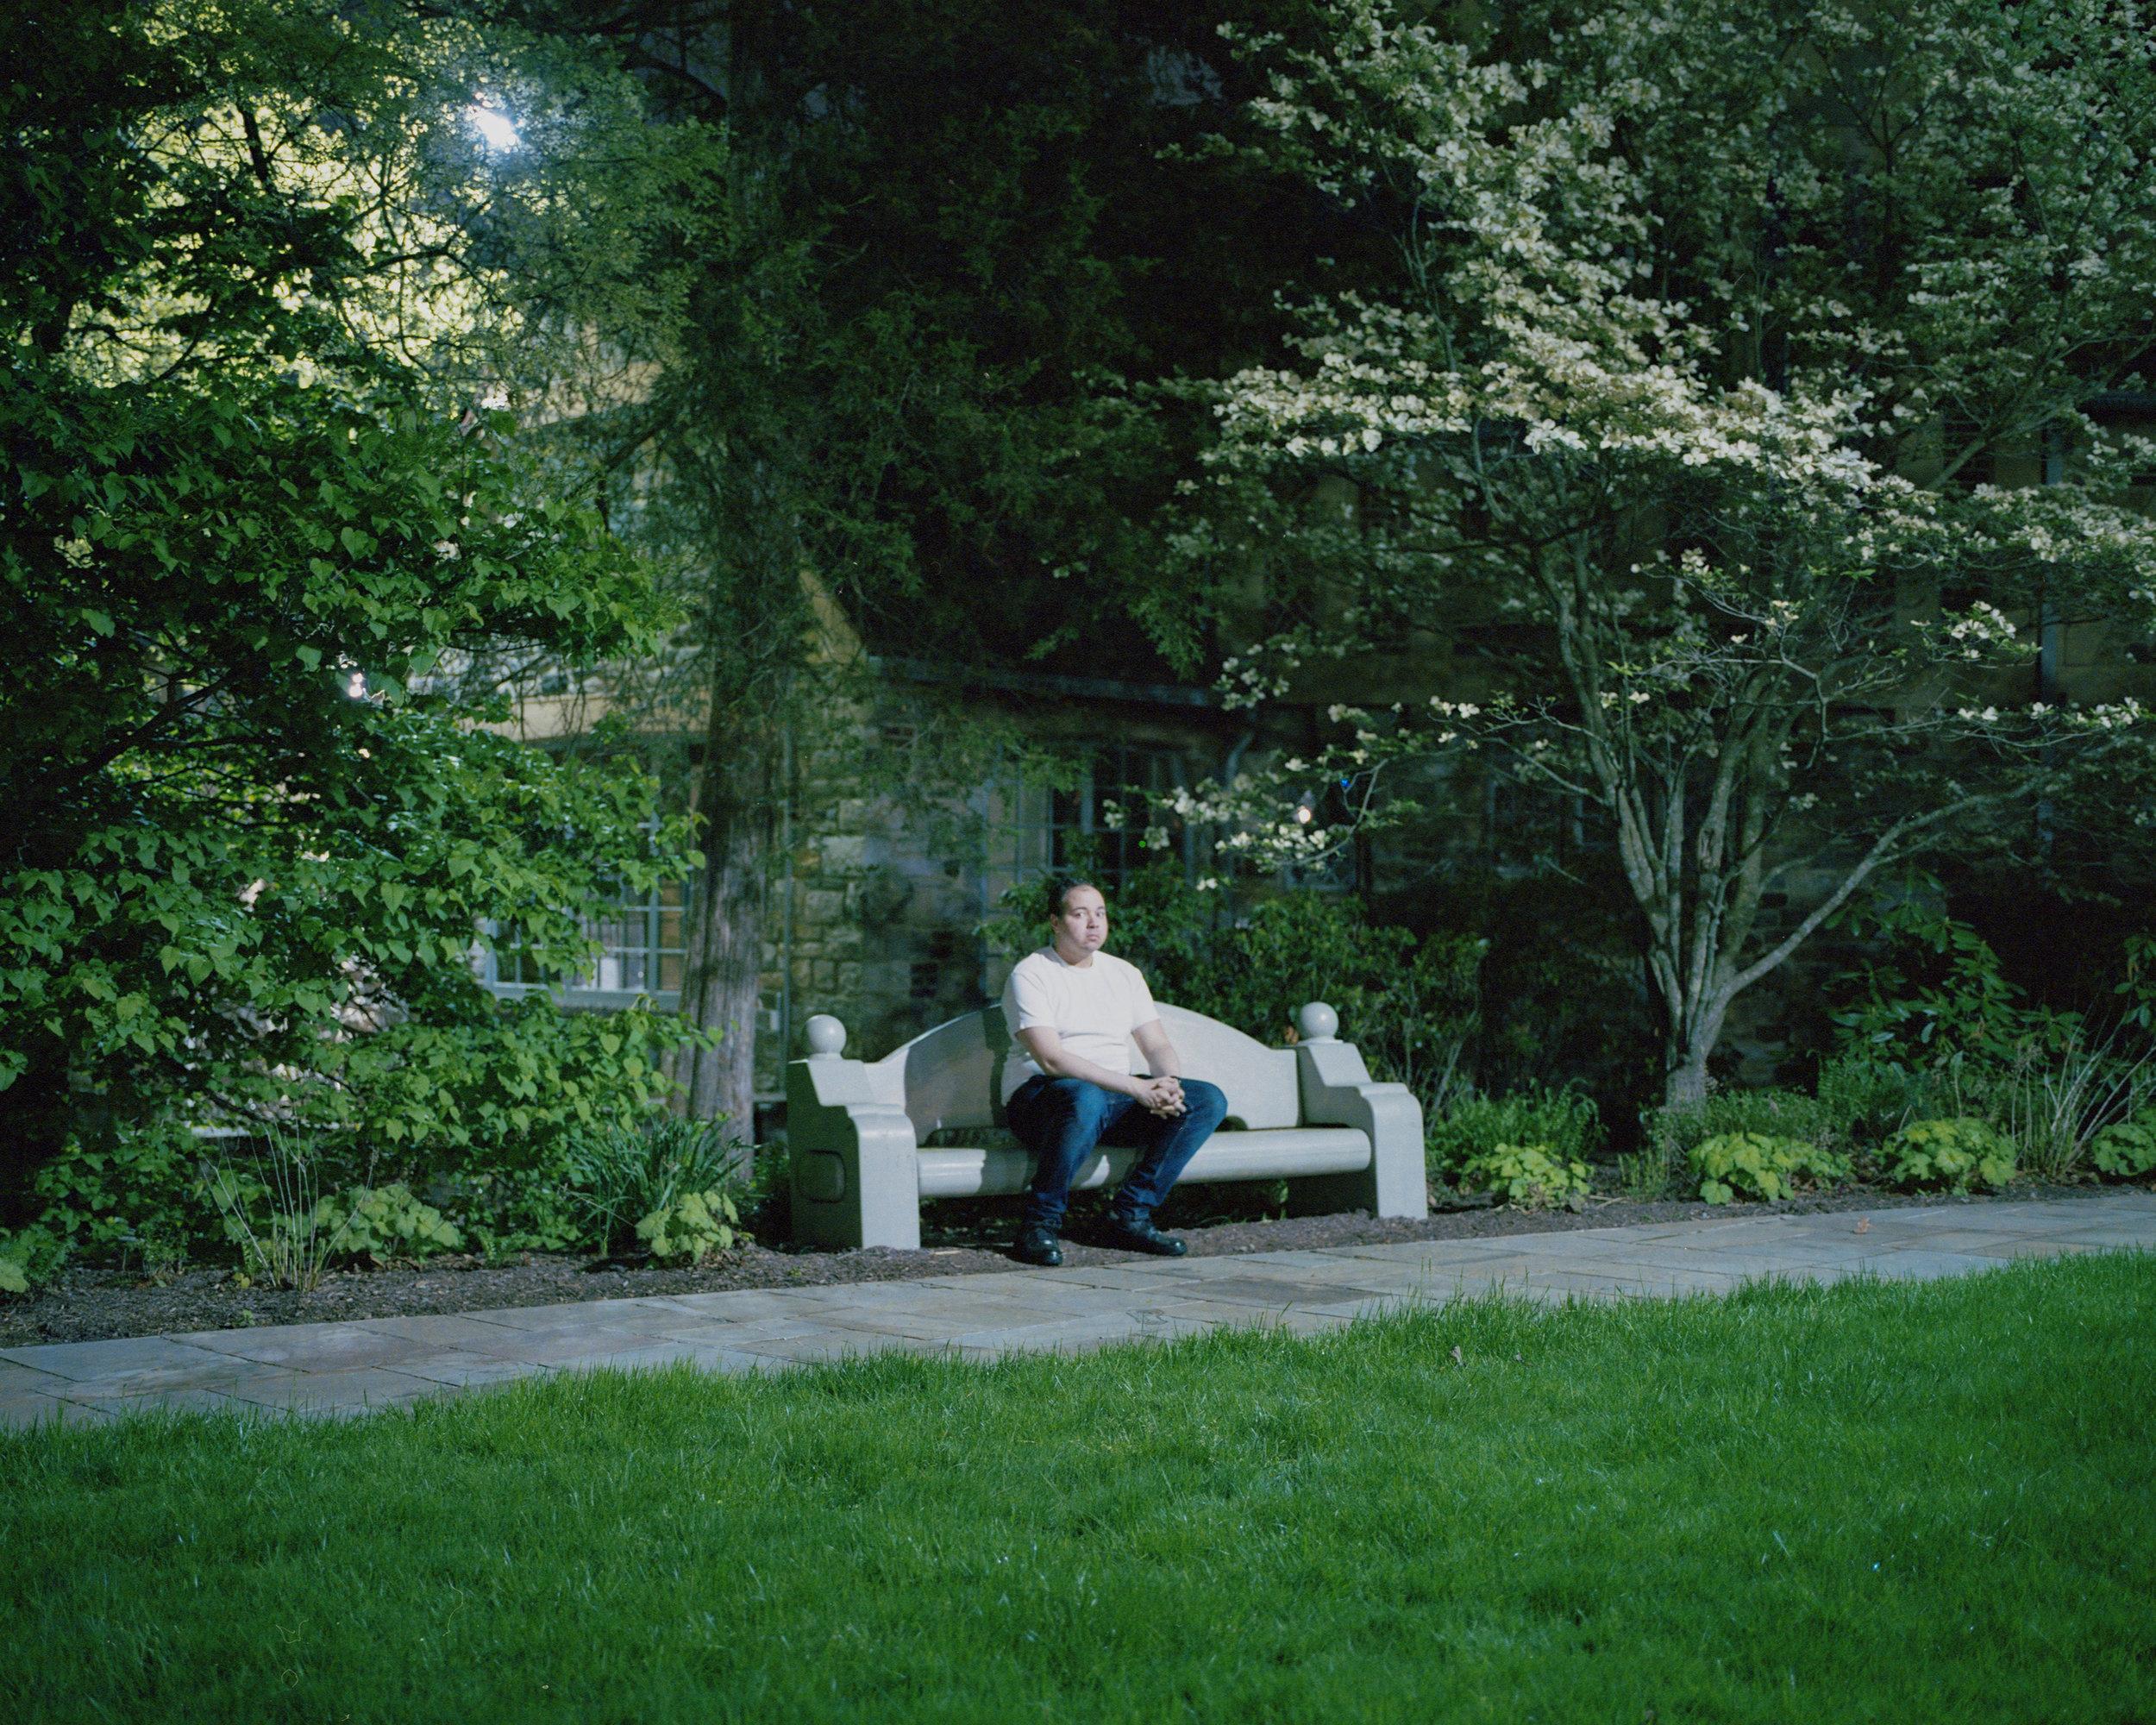 Alone(Self Portrait), 2019